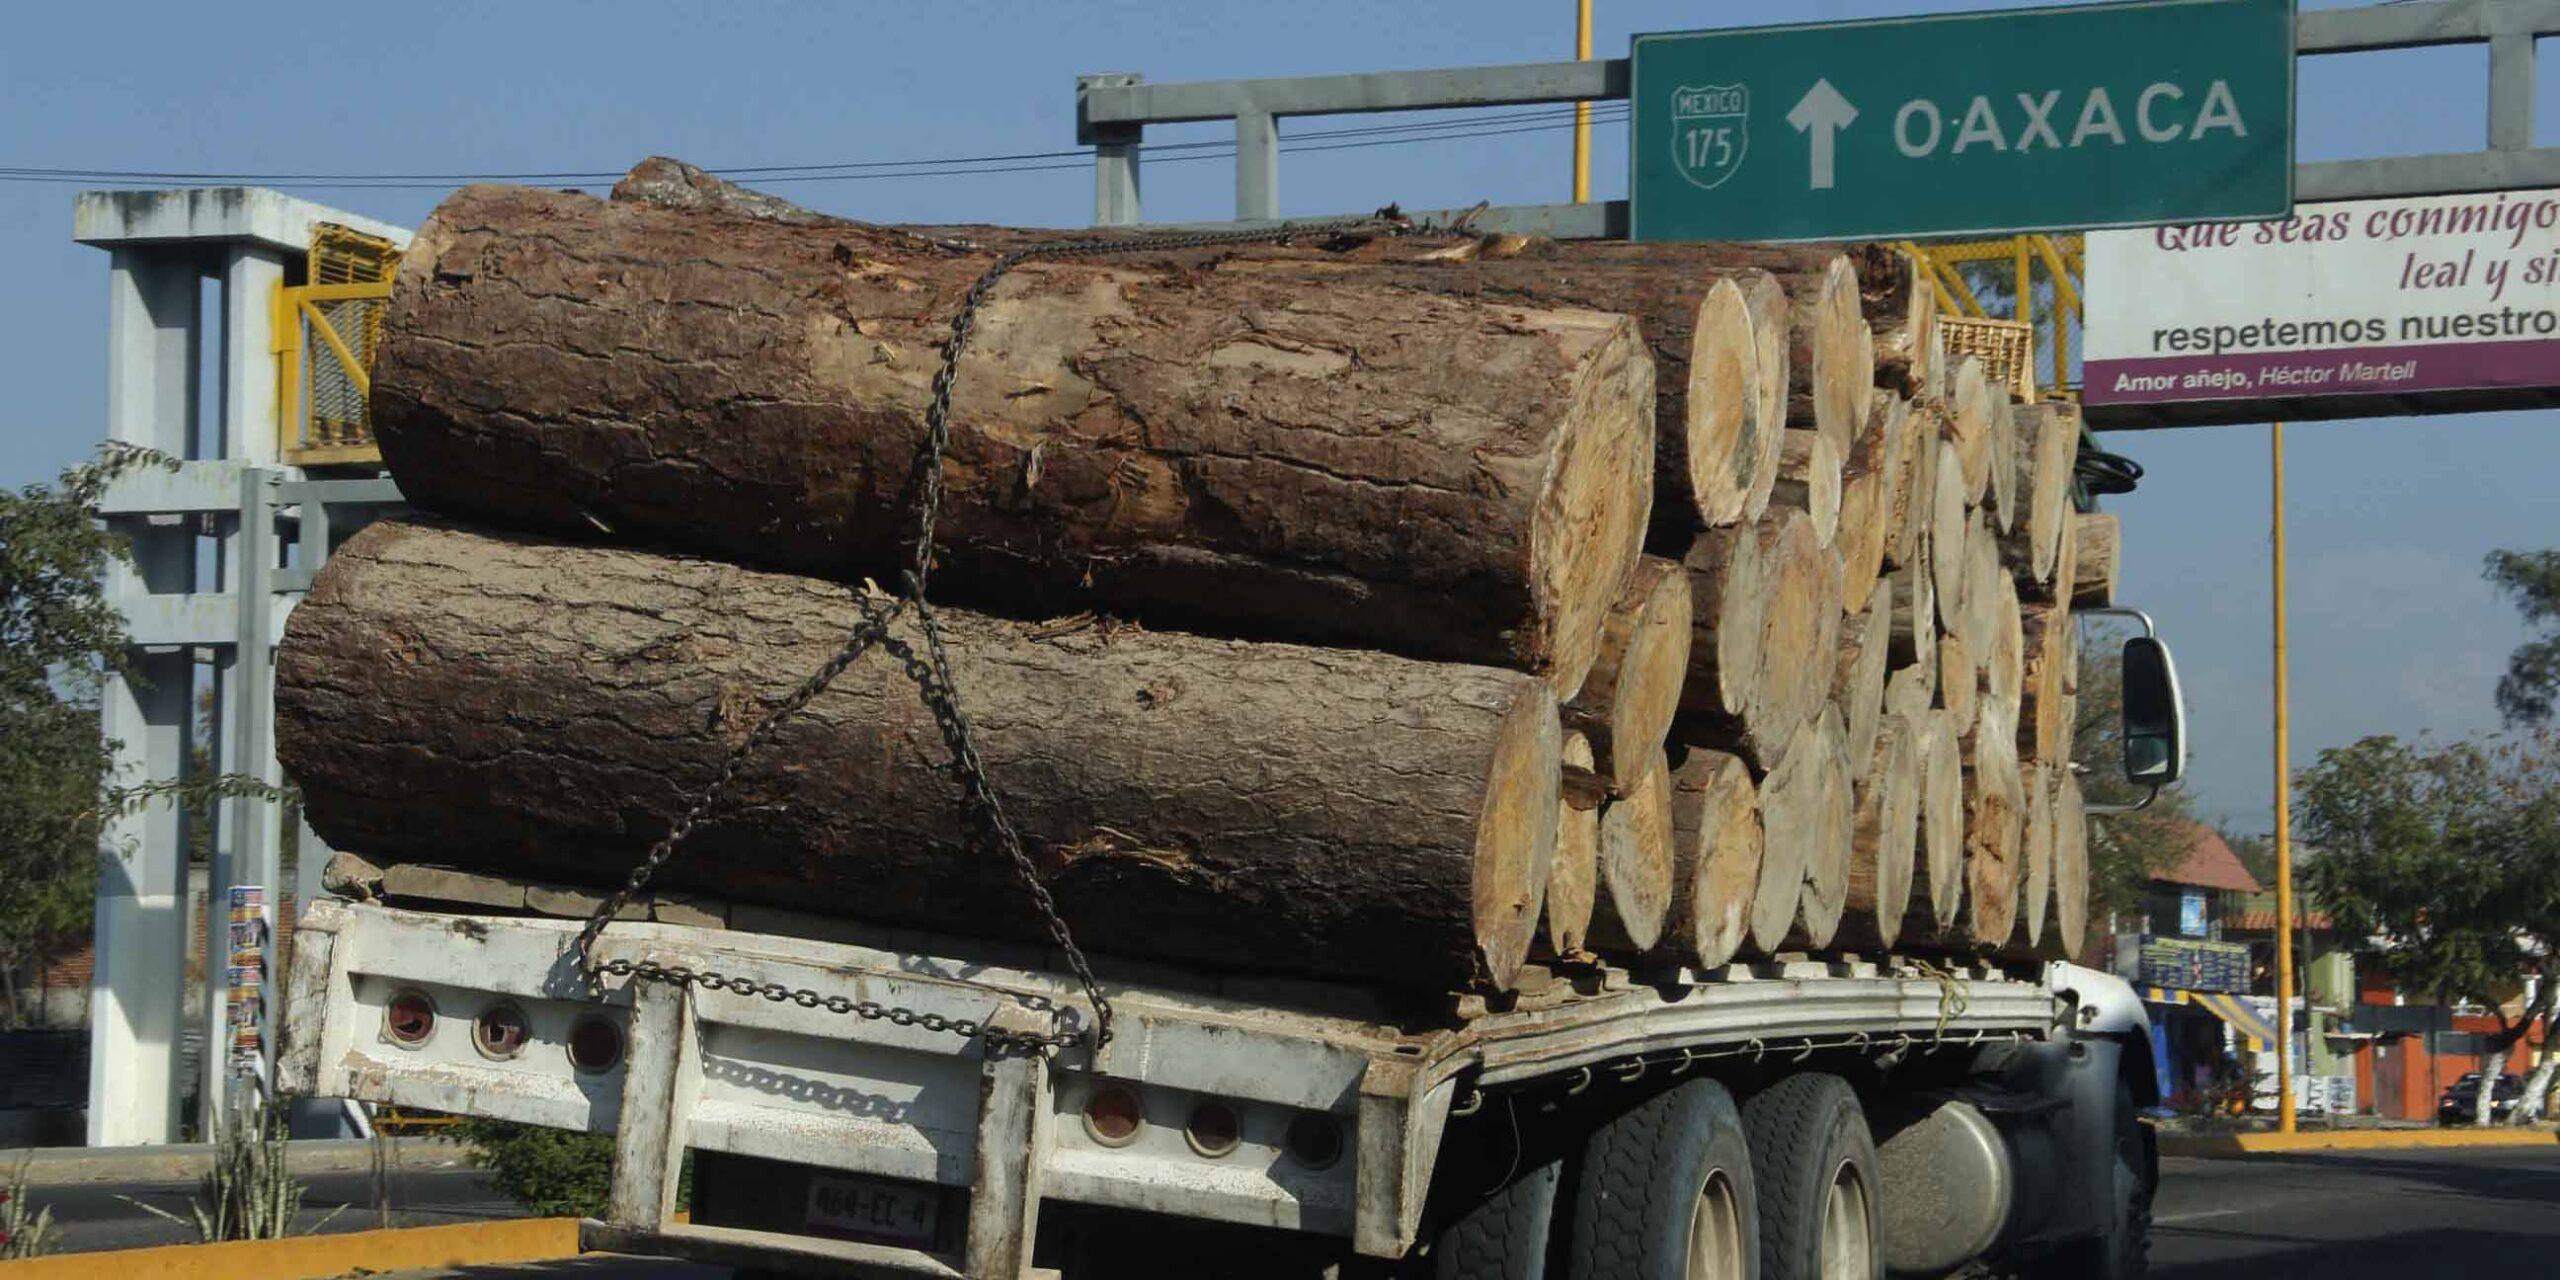 Tala ilegal arrasa con bosques de Oaxaca | El Imparcial de Oaxaca